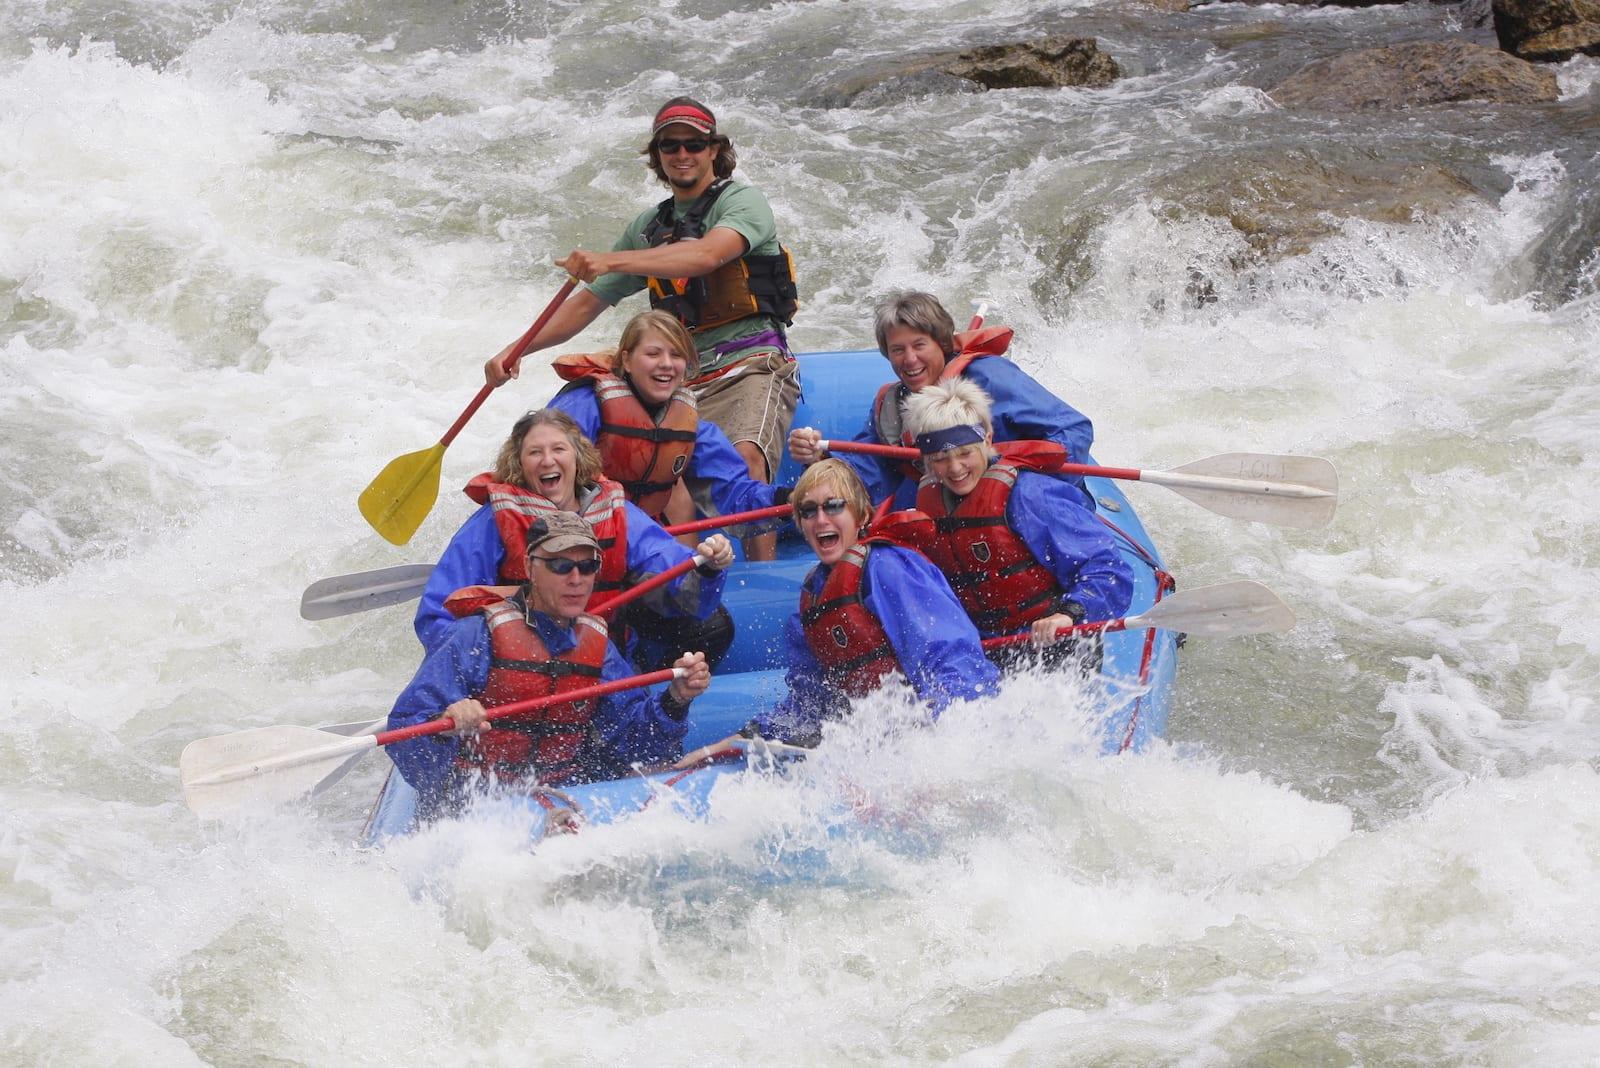 Arkansas River Whitewater Rafting Colorado